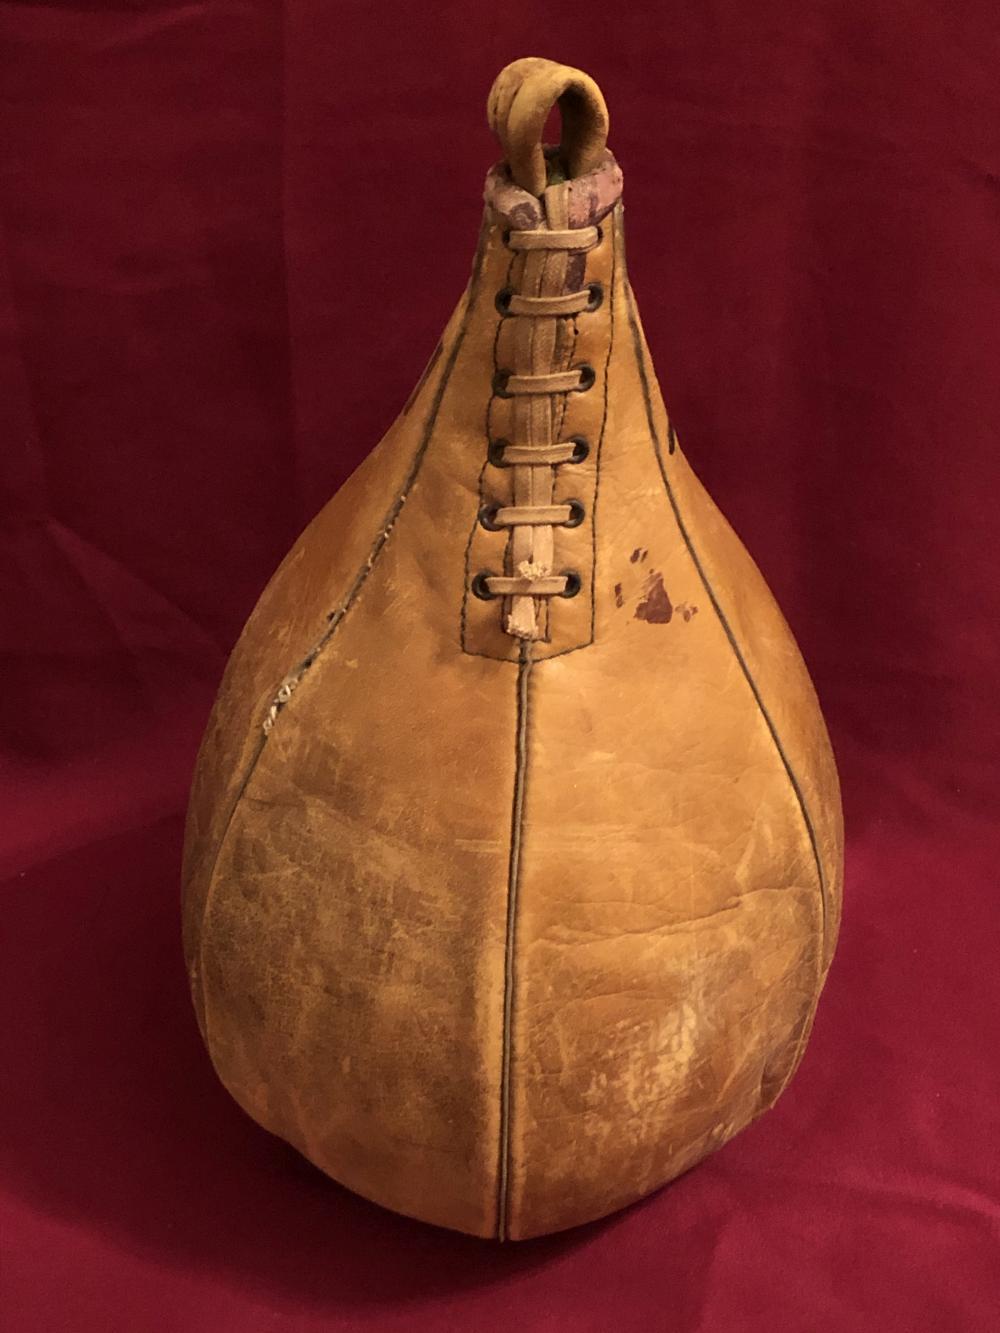 Vintage Everlast leather punching/boxing bag